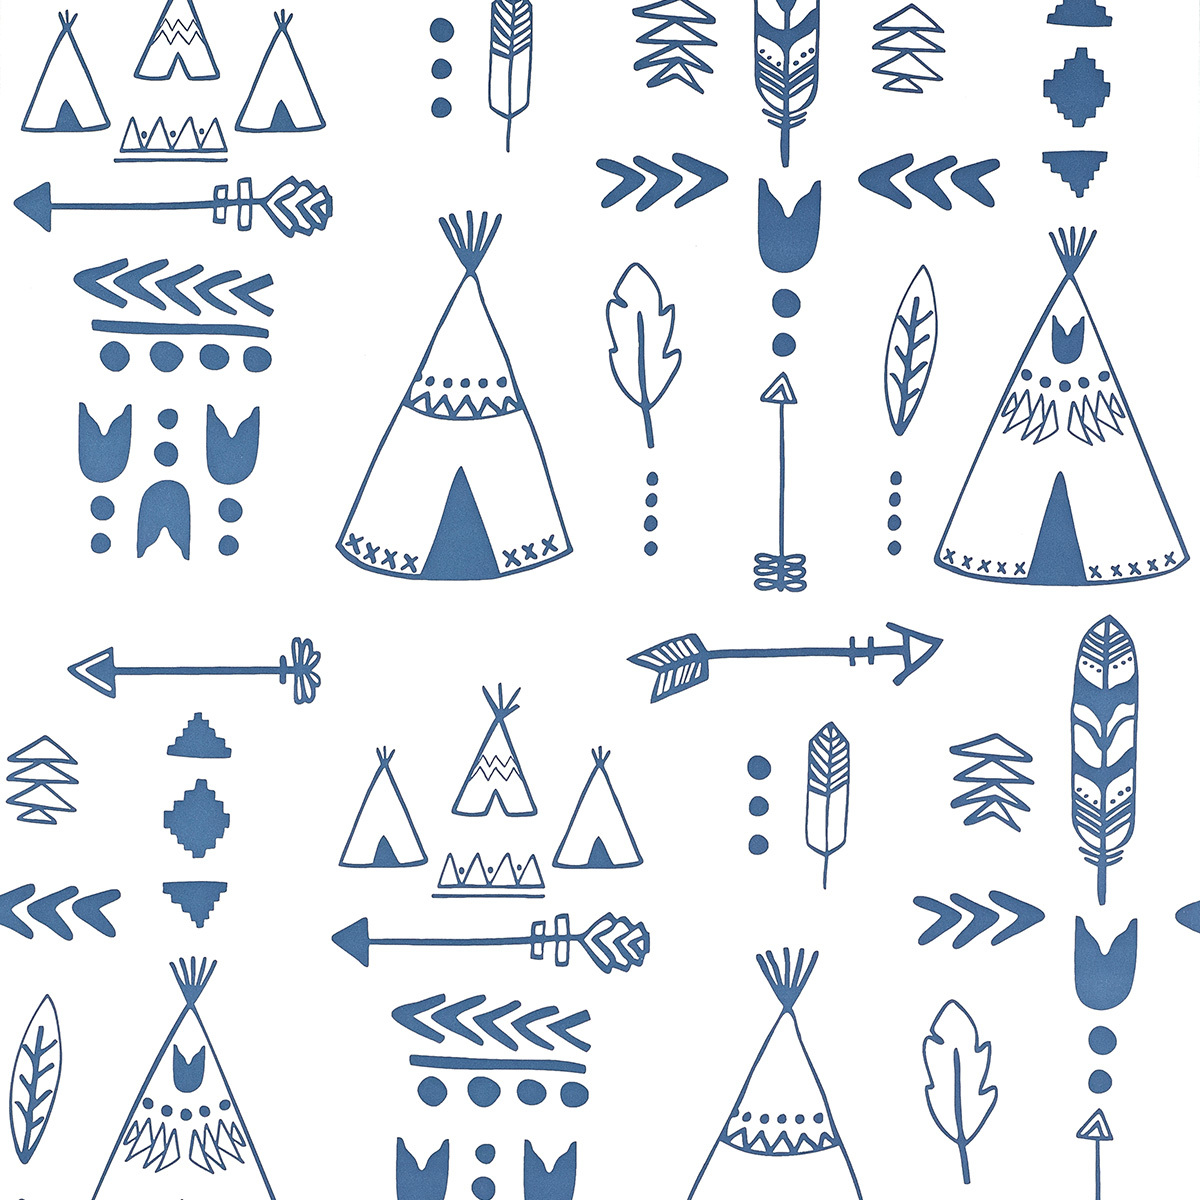 Papier peint Papier Peint Indiens Papier Peint Indiens